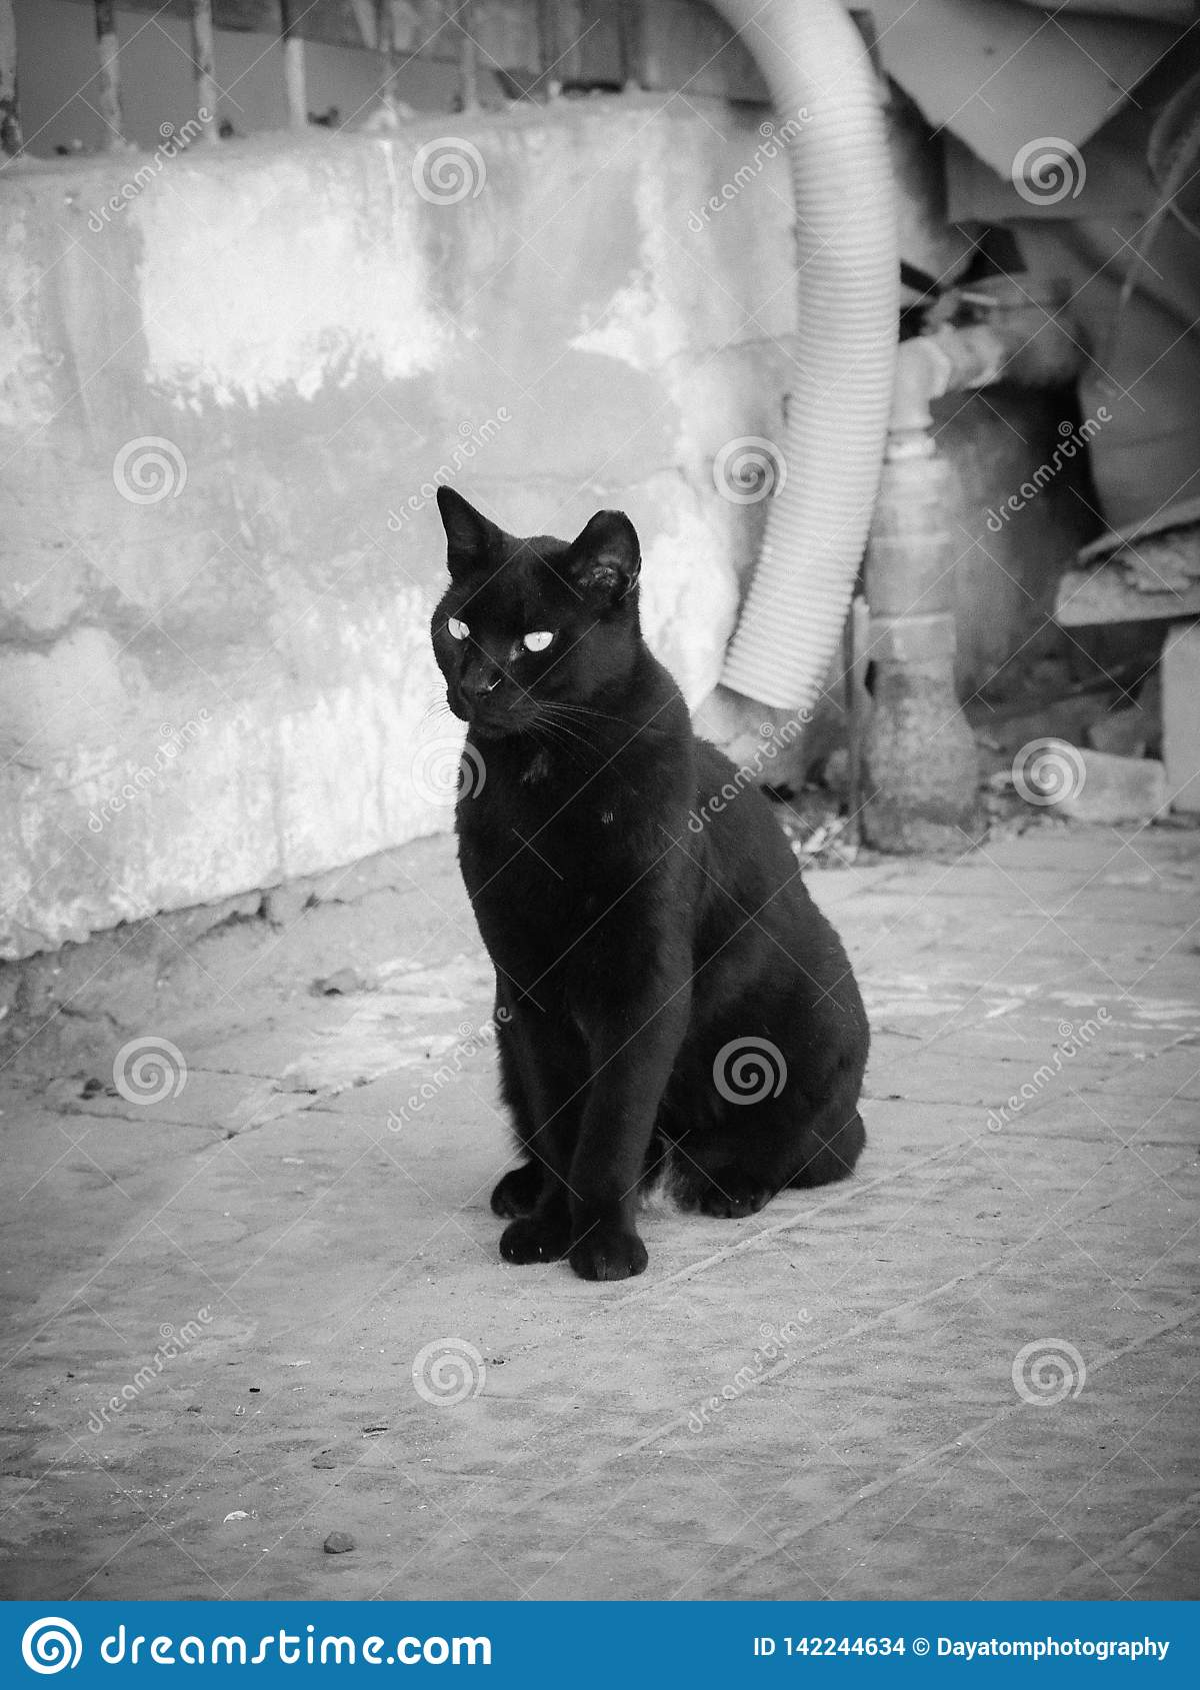 Enkel svart behagfull katt som utomhus står på trottoar